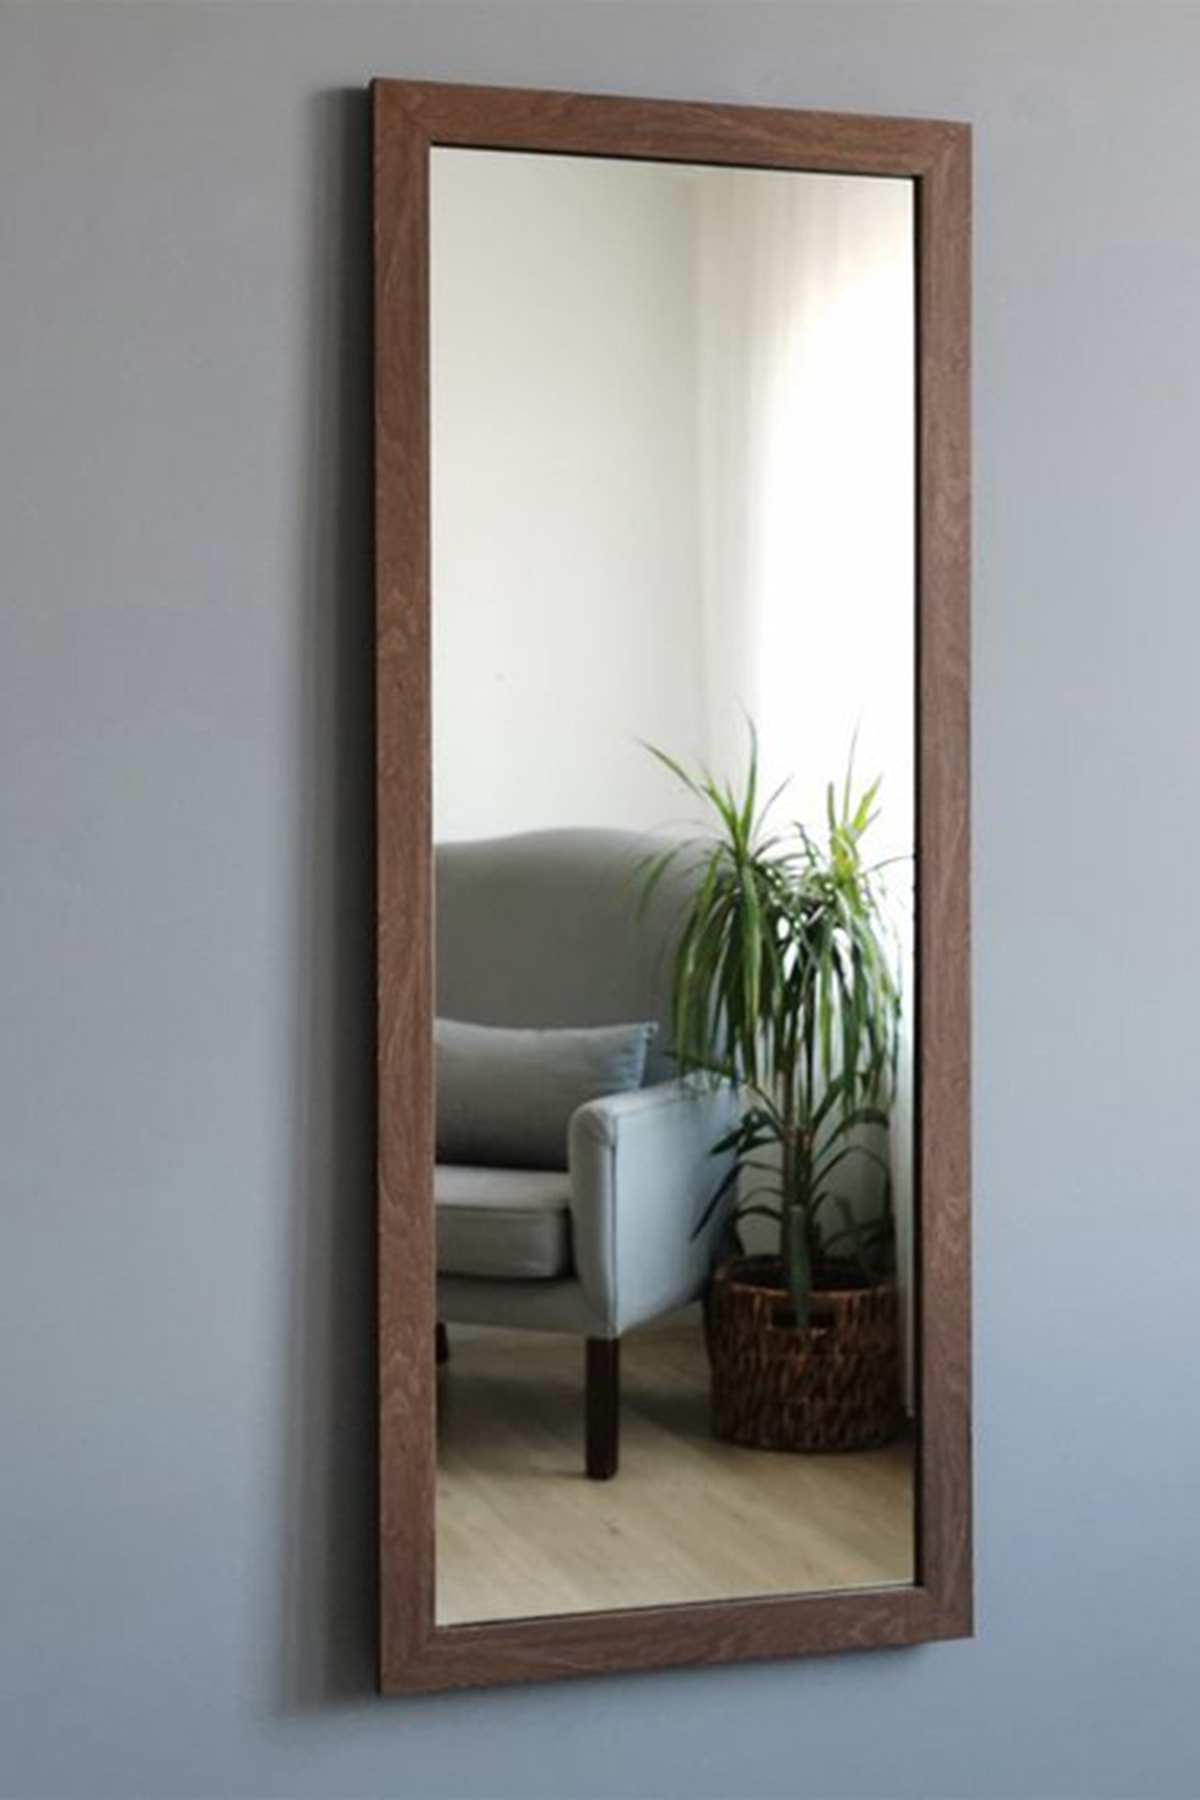 Vivense Neostill - 45X110 Cm Dekoratif Duvar Salon Ofis Boy Ayna A207